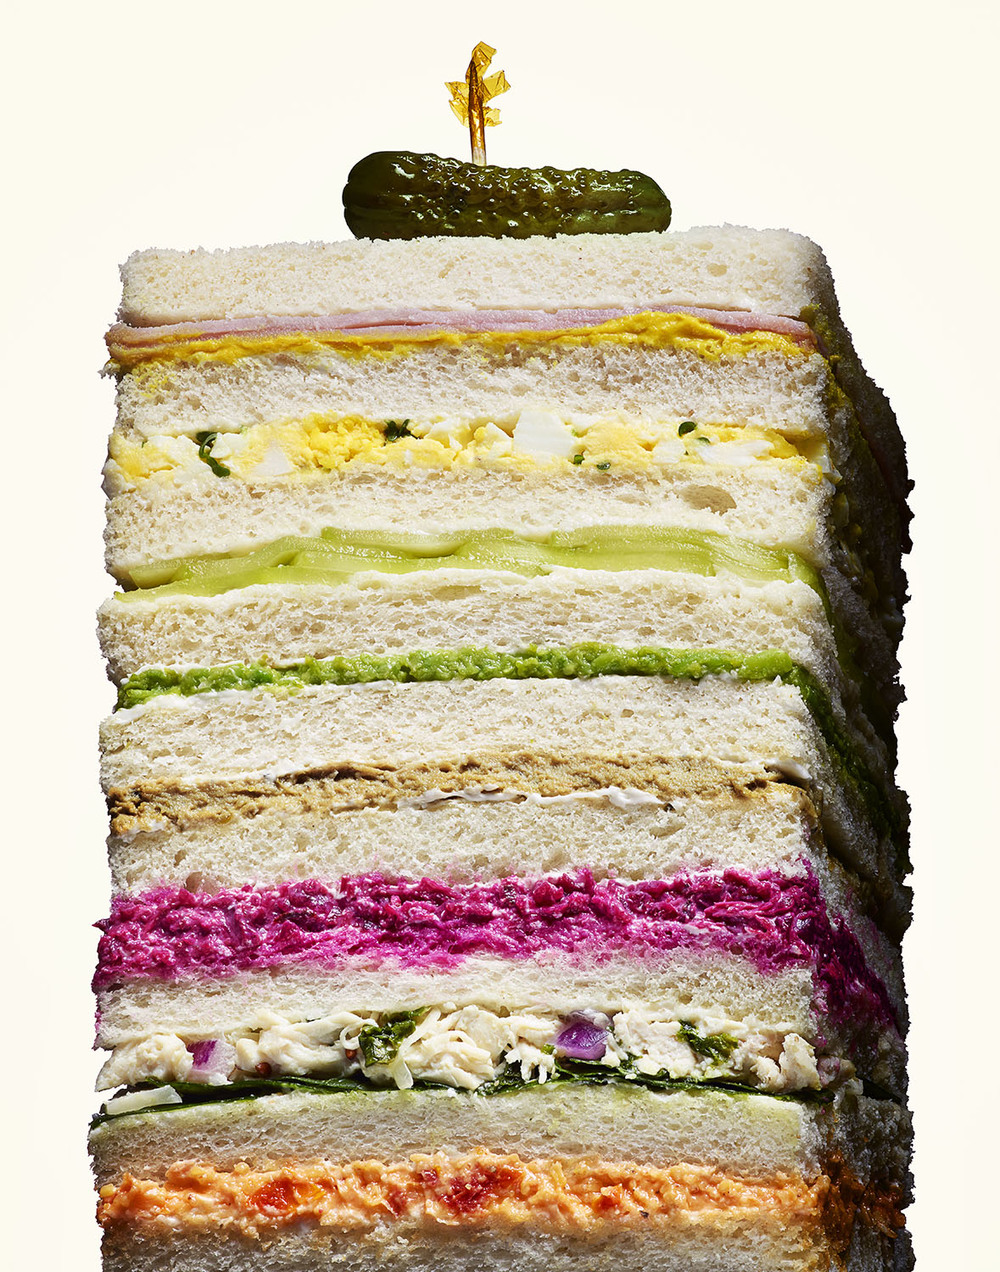 Argentinian Sandwich de Miga